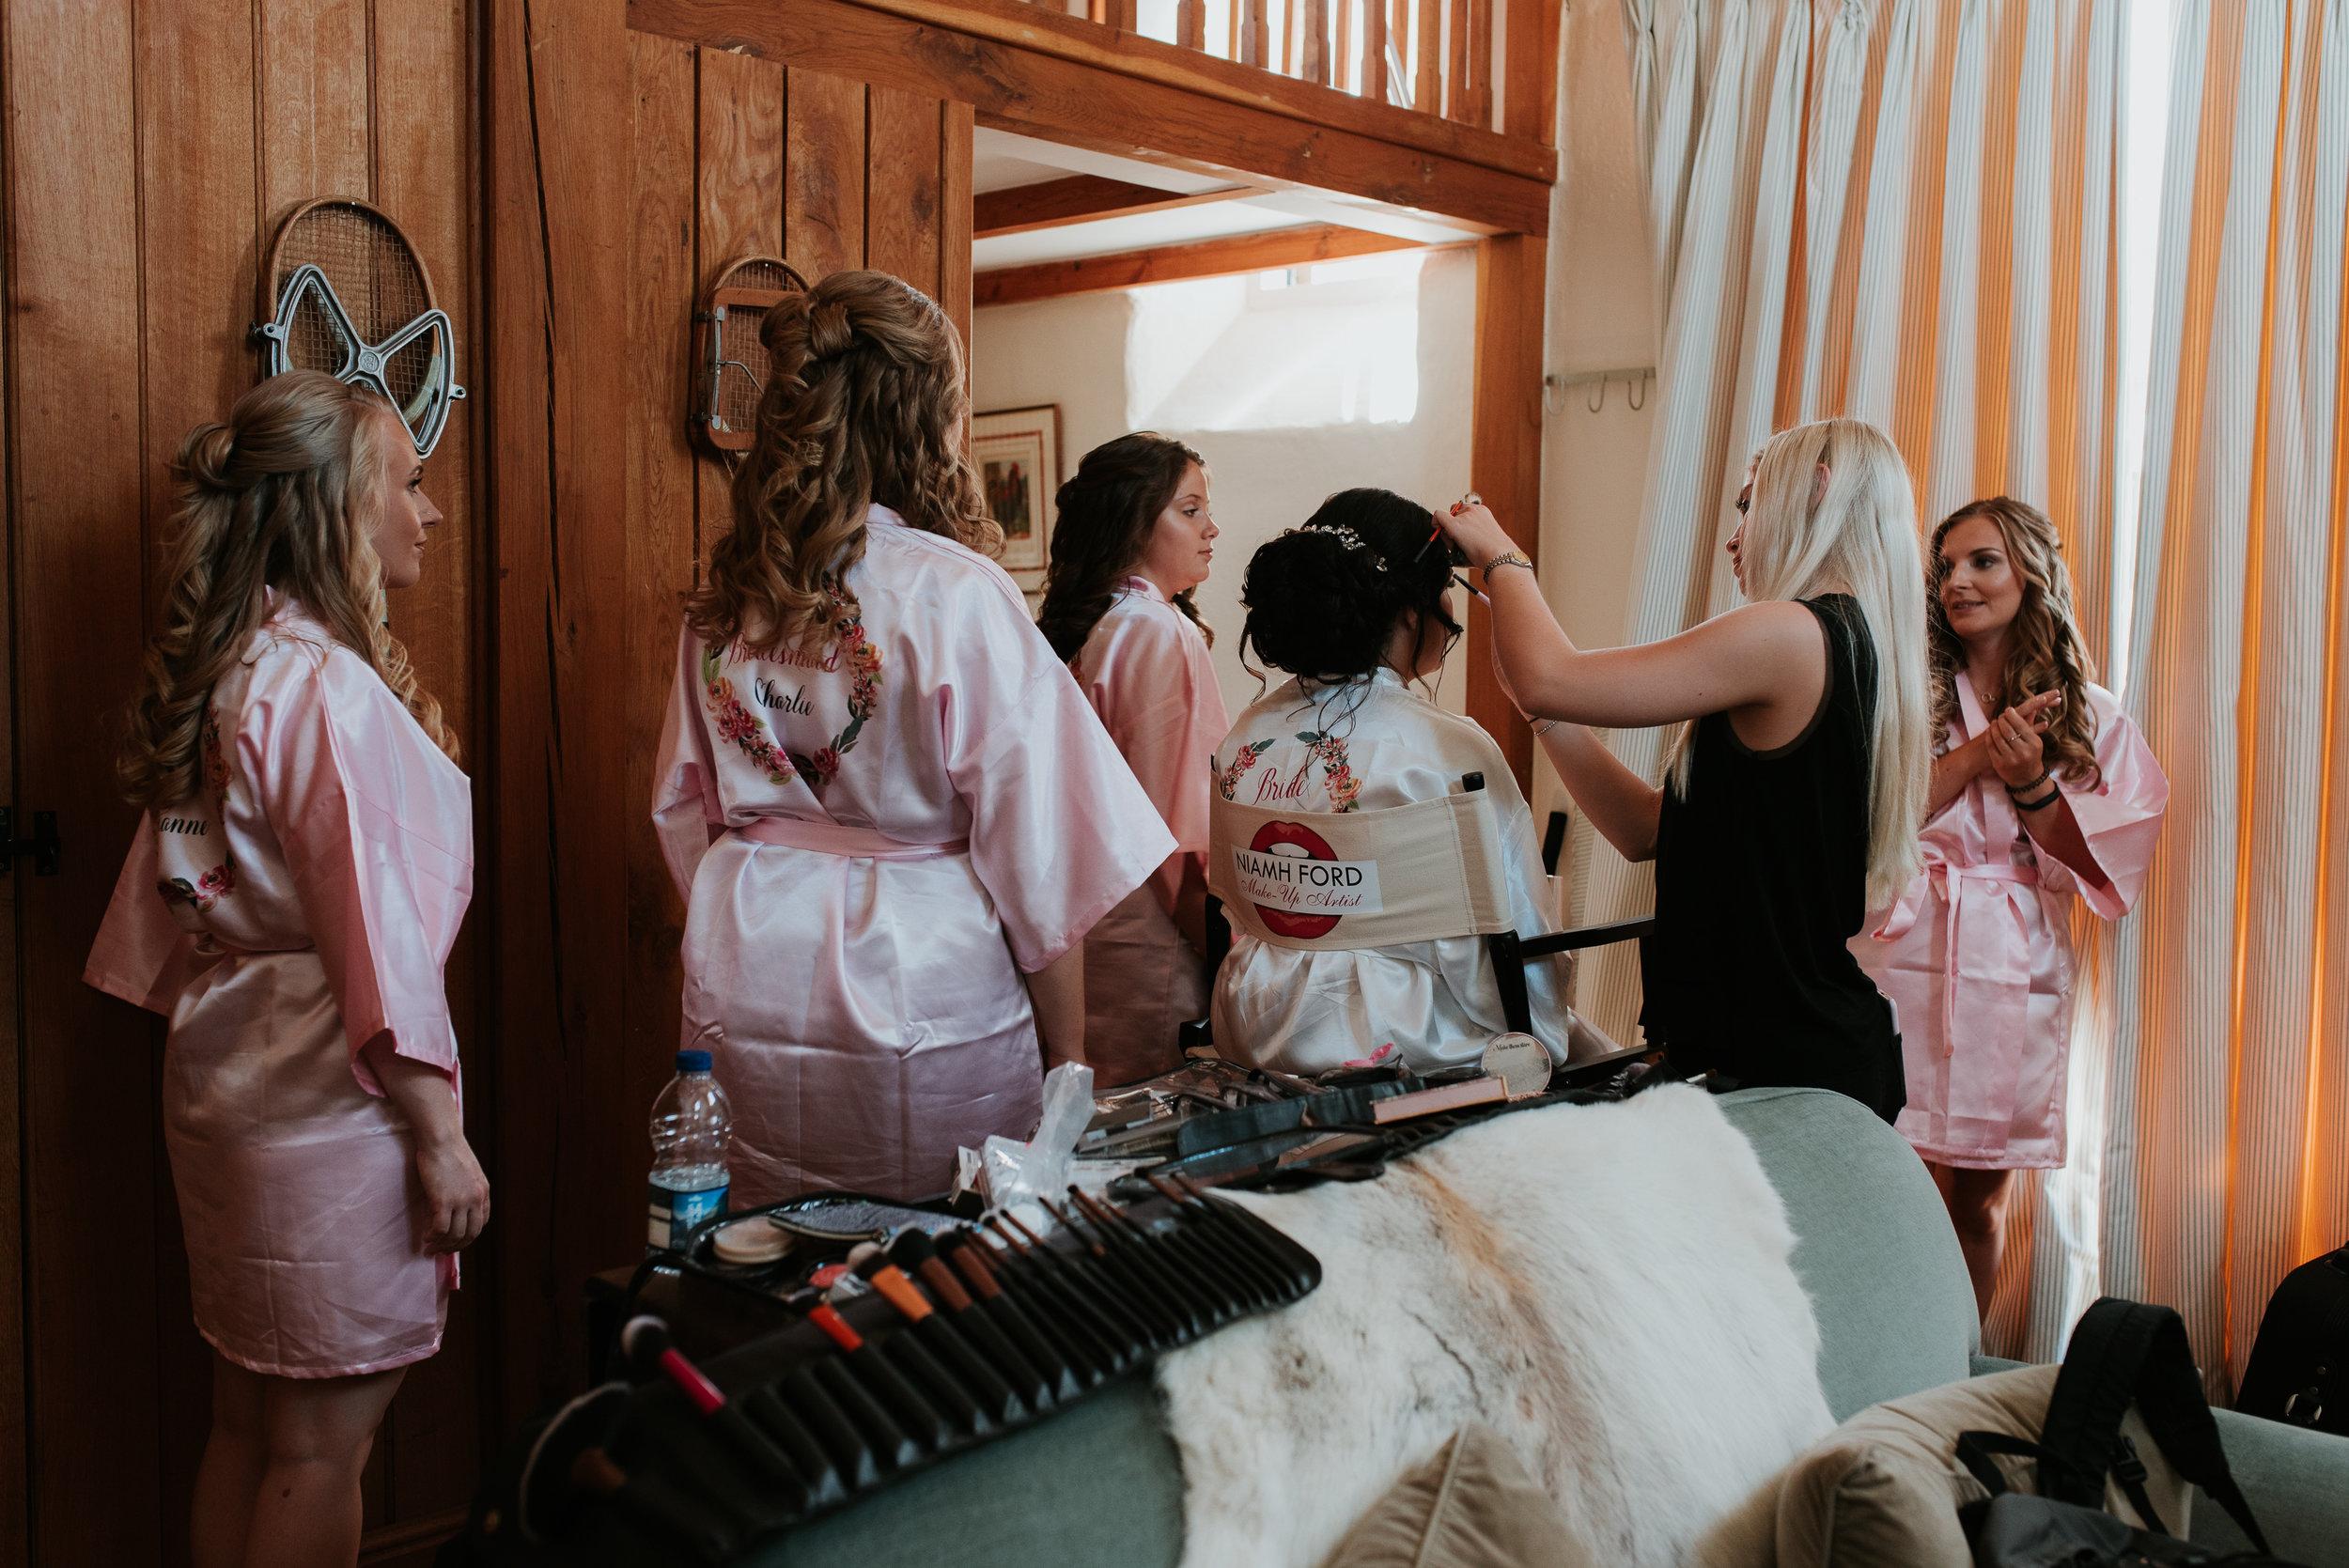 Oxfordshire-wedding-photographer-20.jpg